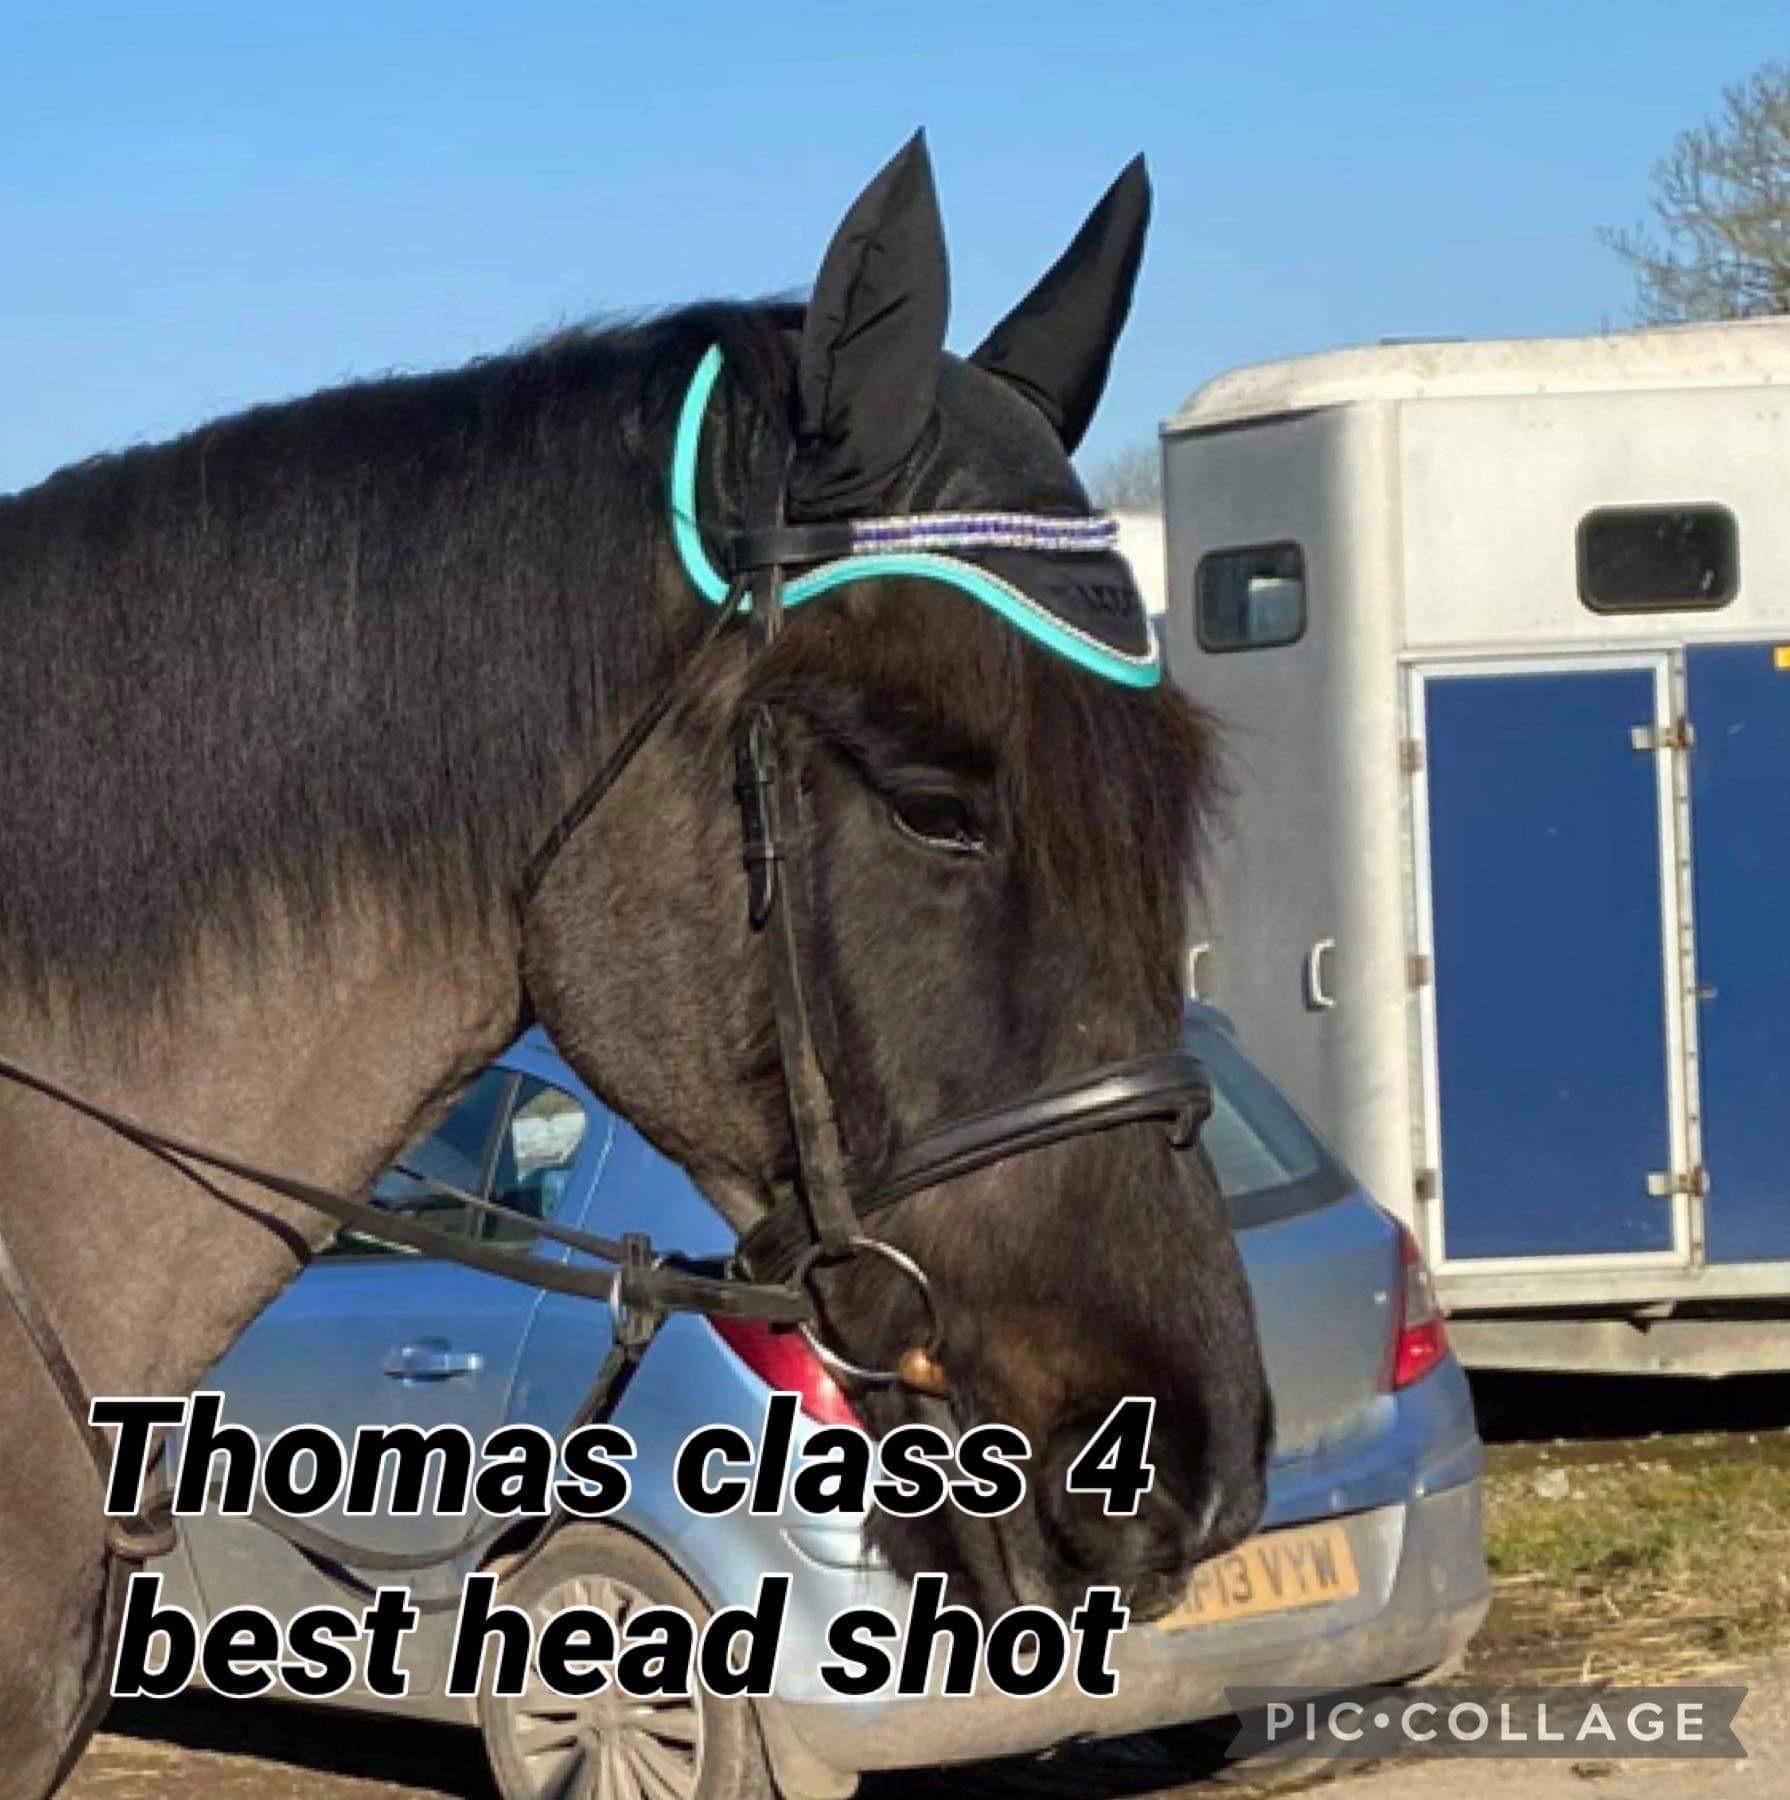 Claire Sheppard - Thomas - class 4